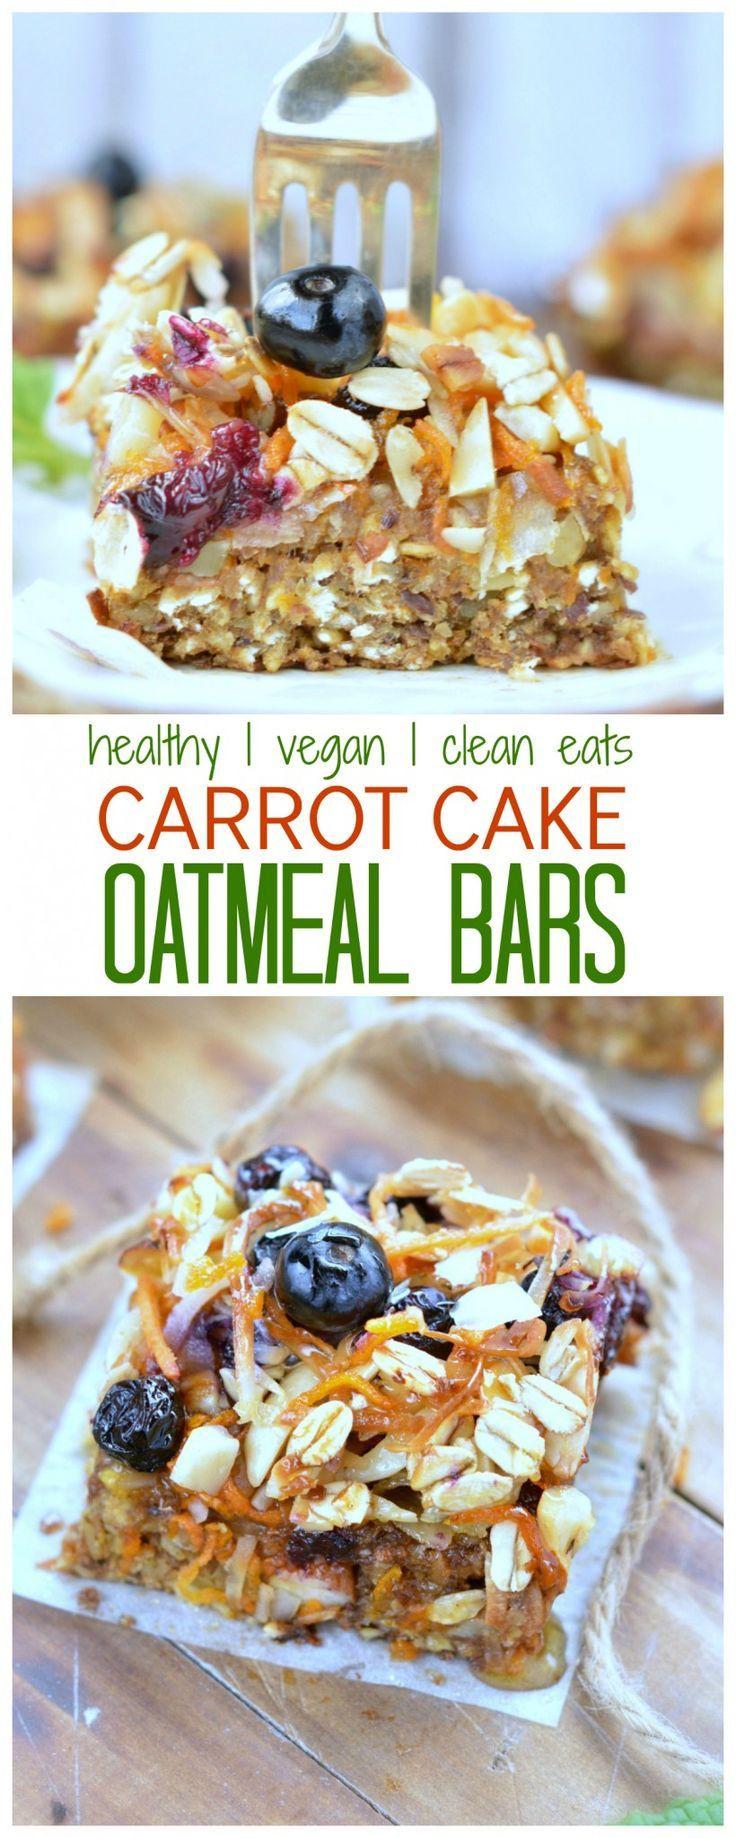 Healthy Breakfast Baking Recipes  Carrot Cake Baked Oatmeal Bars